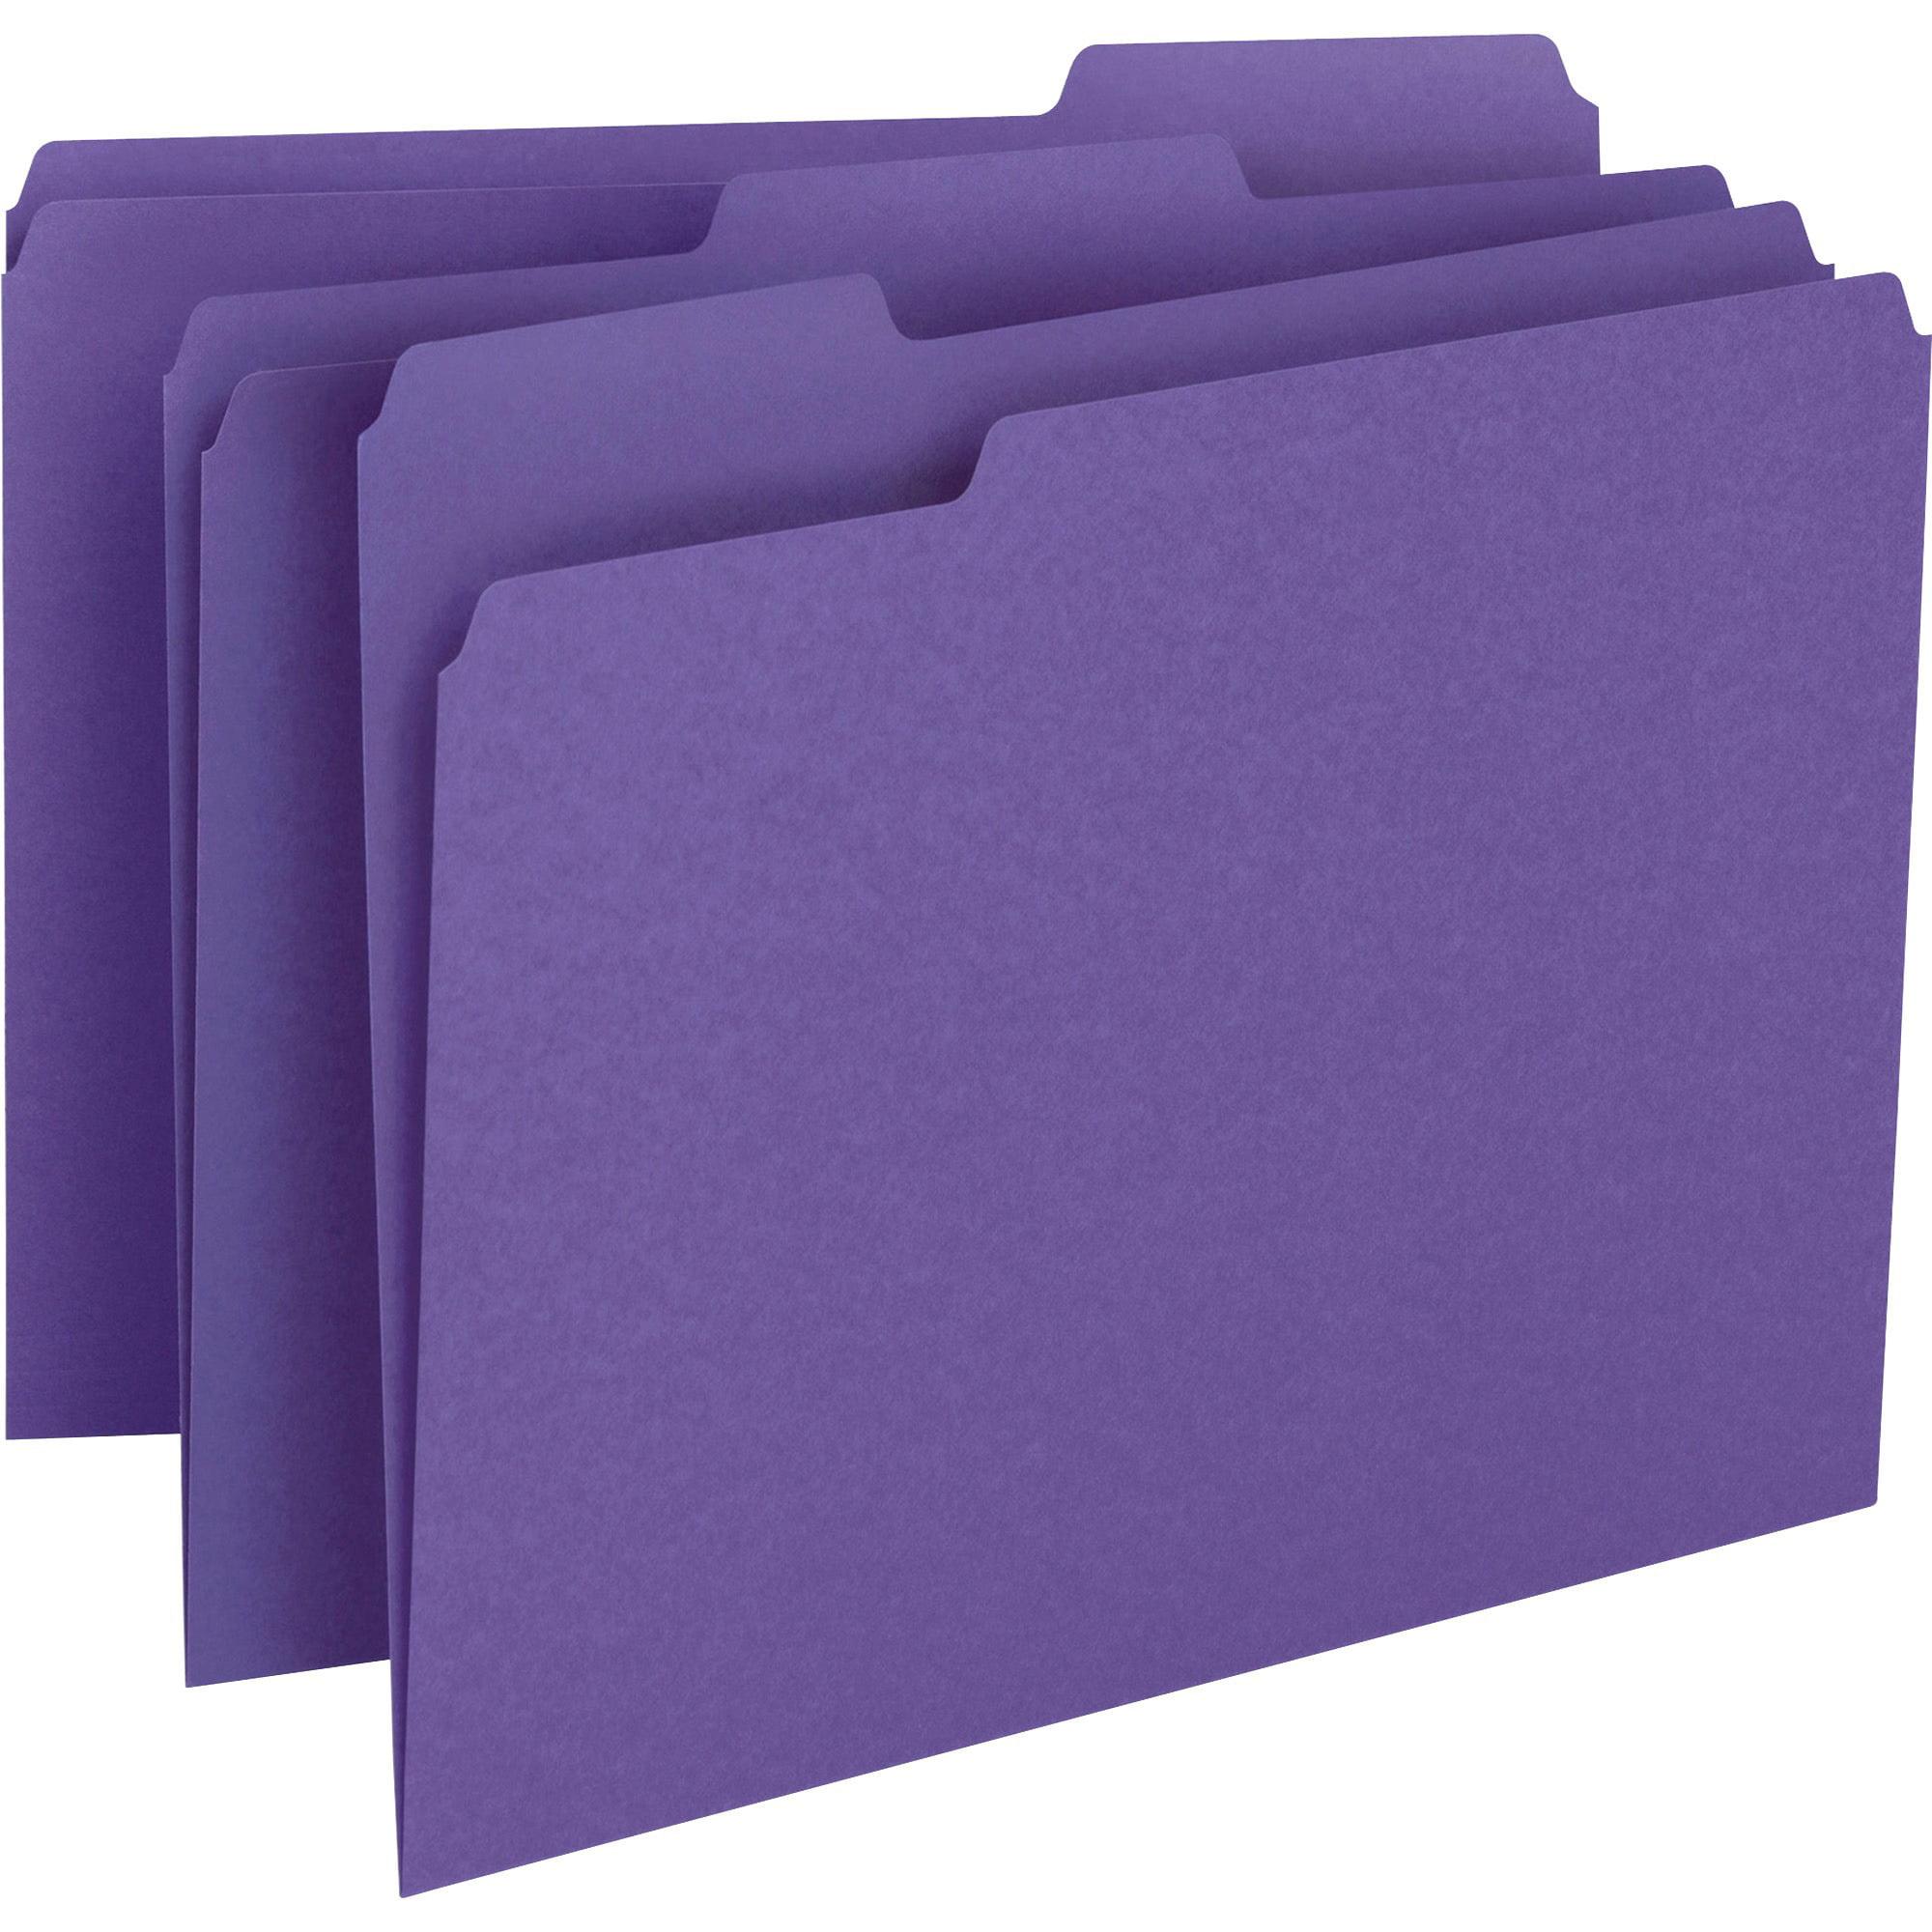 Smead File Folder, 1/3-Cut Tab, Letter Size, Purple, 100 per Box (13043)